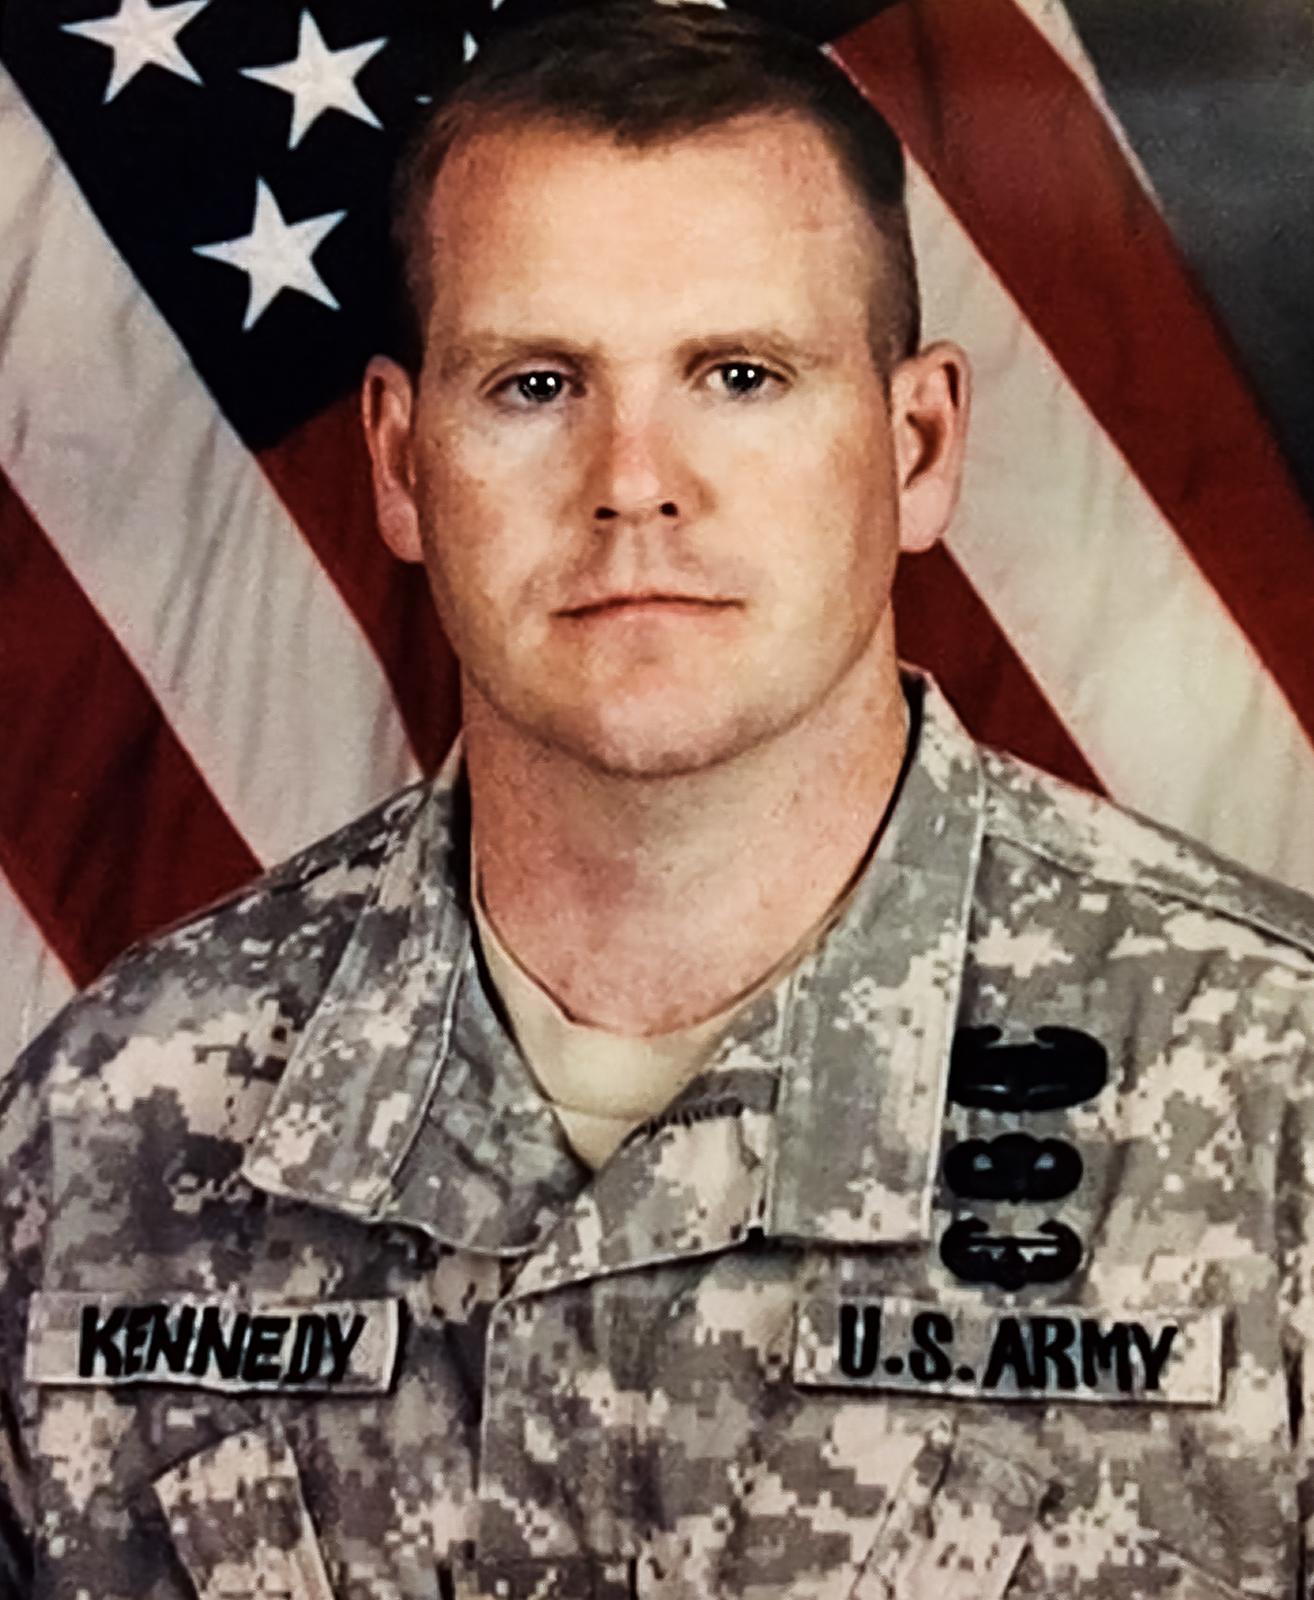 Tom kennedy us army claims service - Tom Kennedy Us Army Claims Service 44